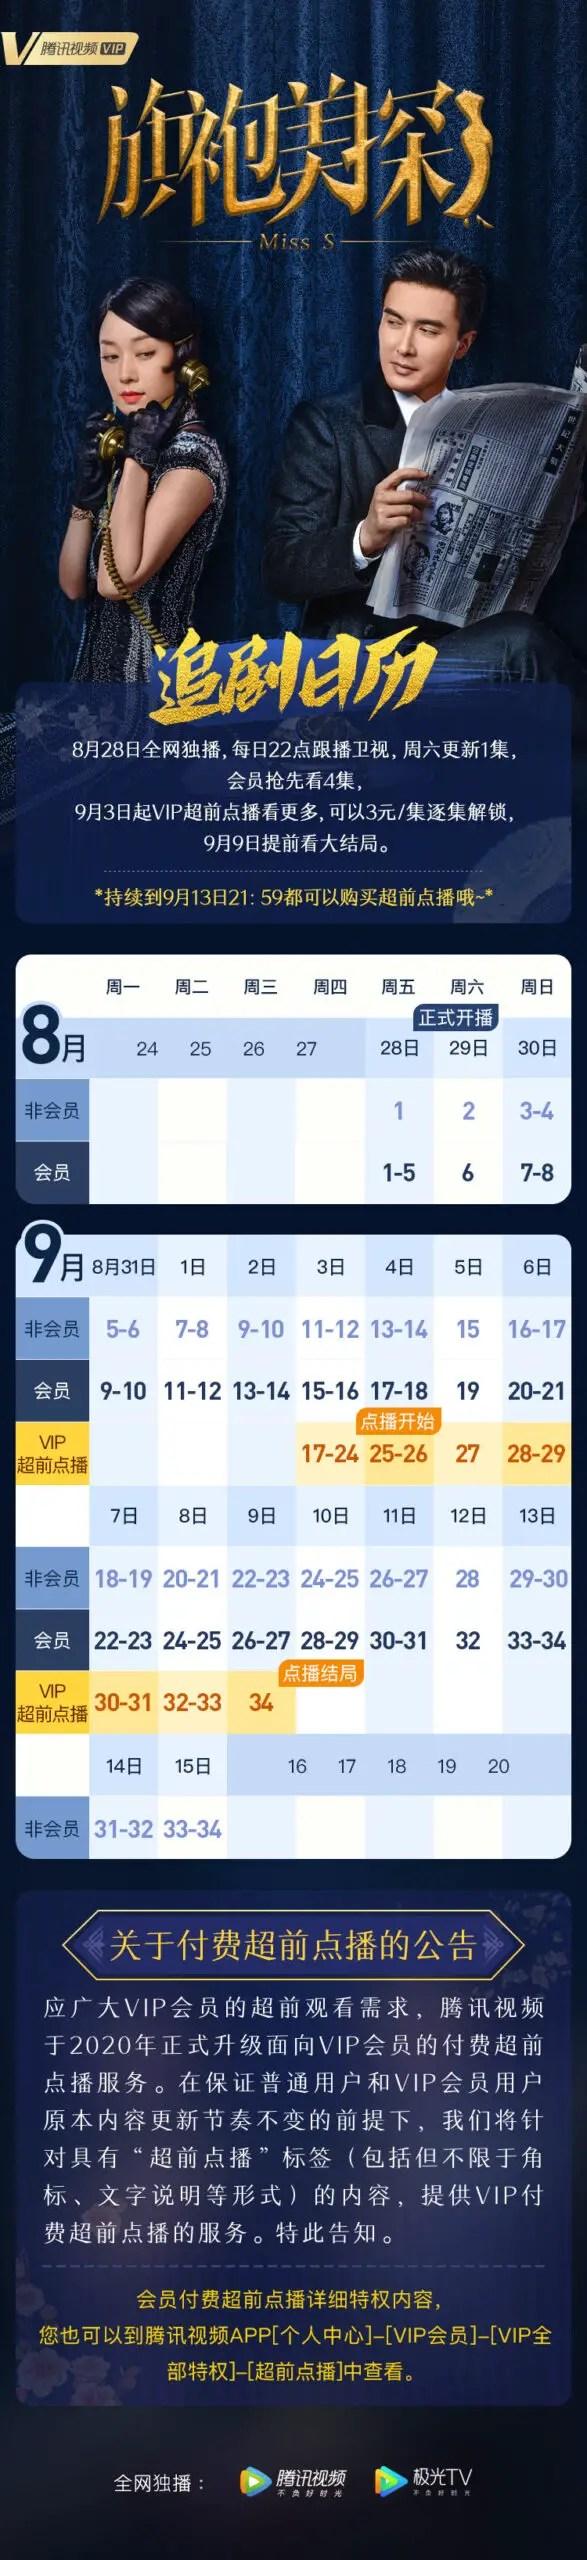 Miss S Chinese Drama Airing Calendar